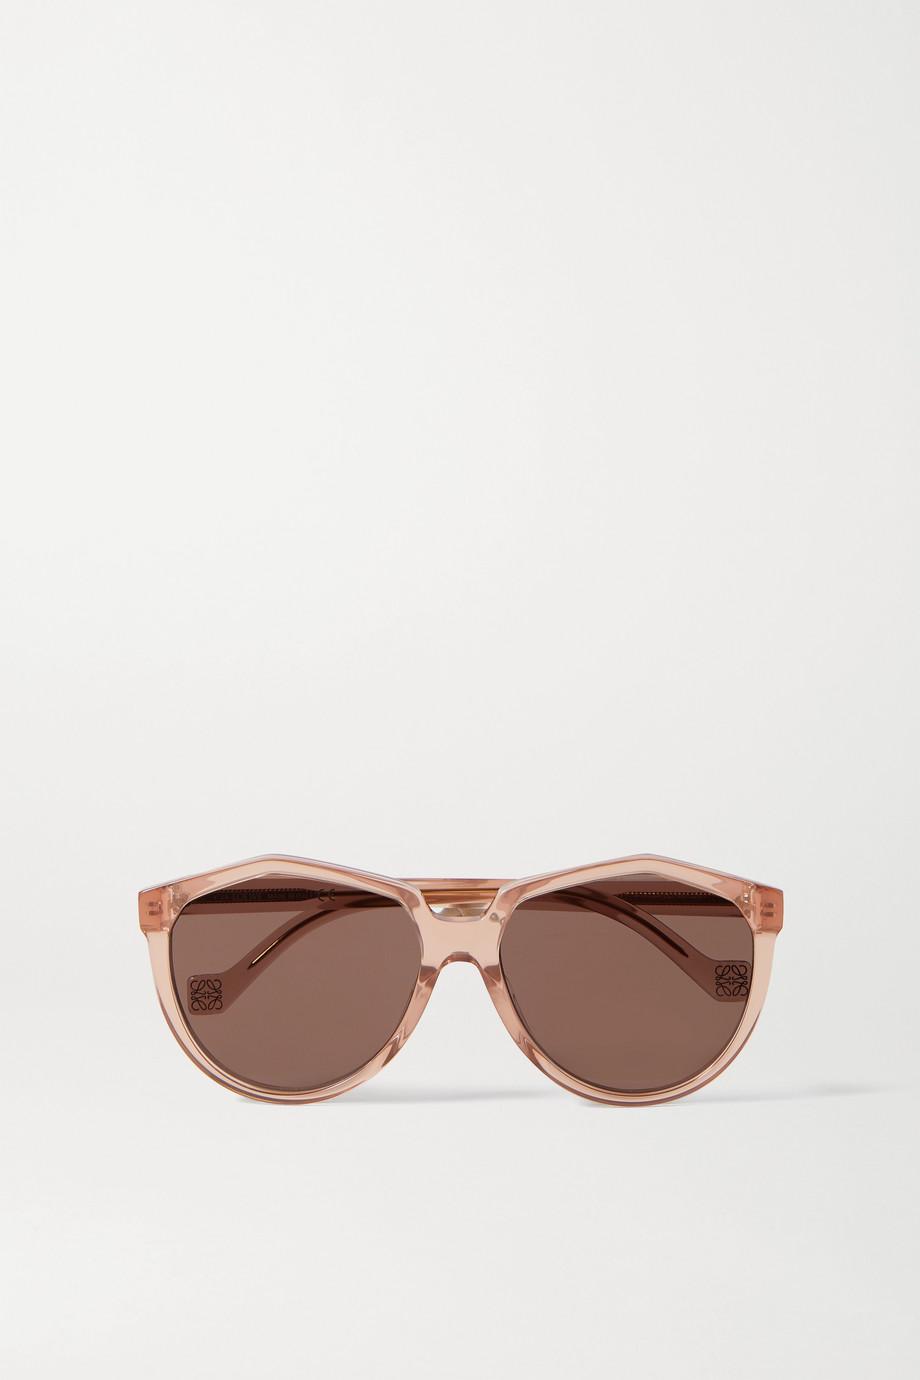 Loewe Round-frame acetate sunglasses